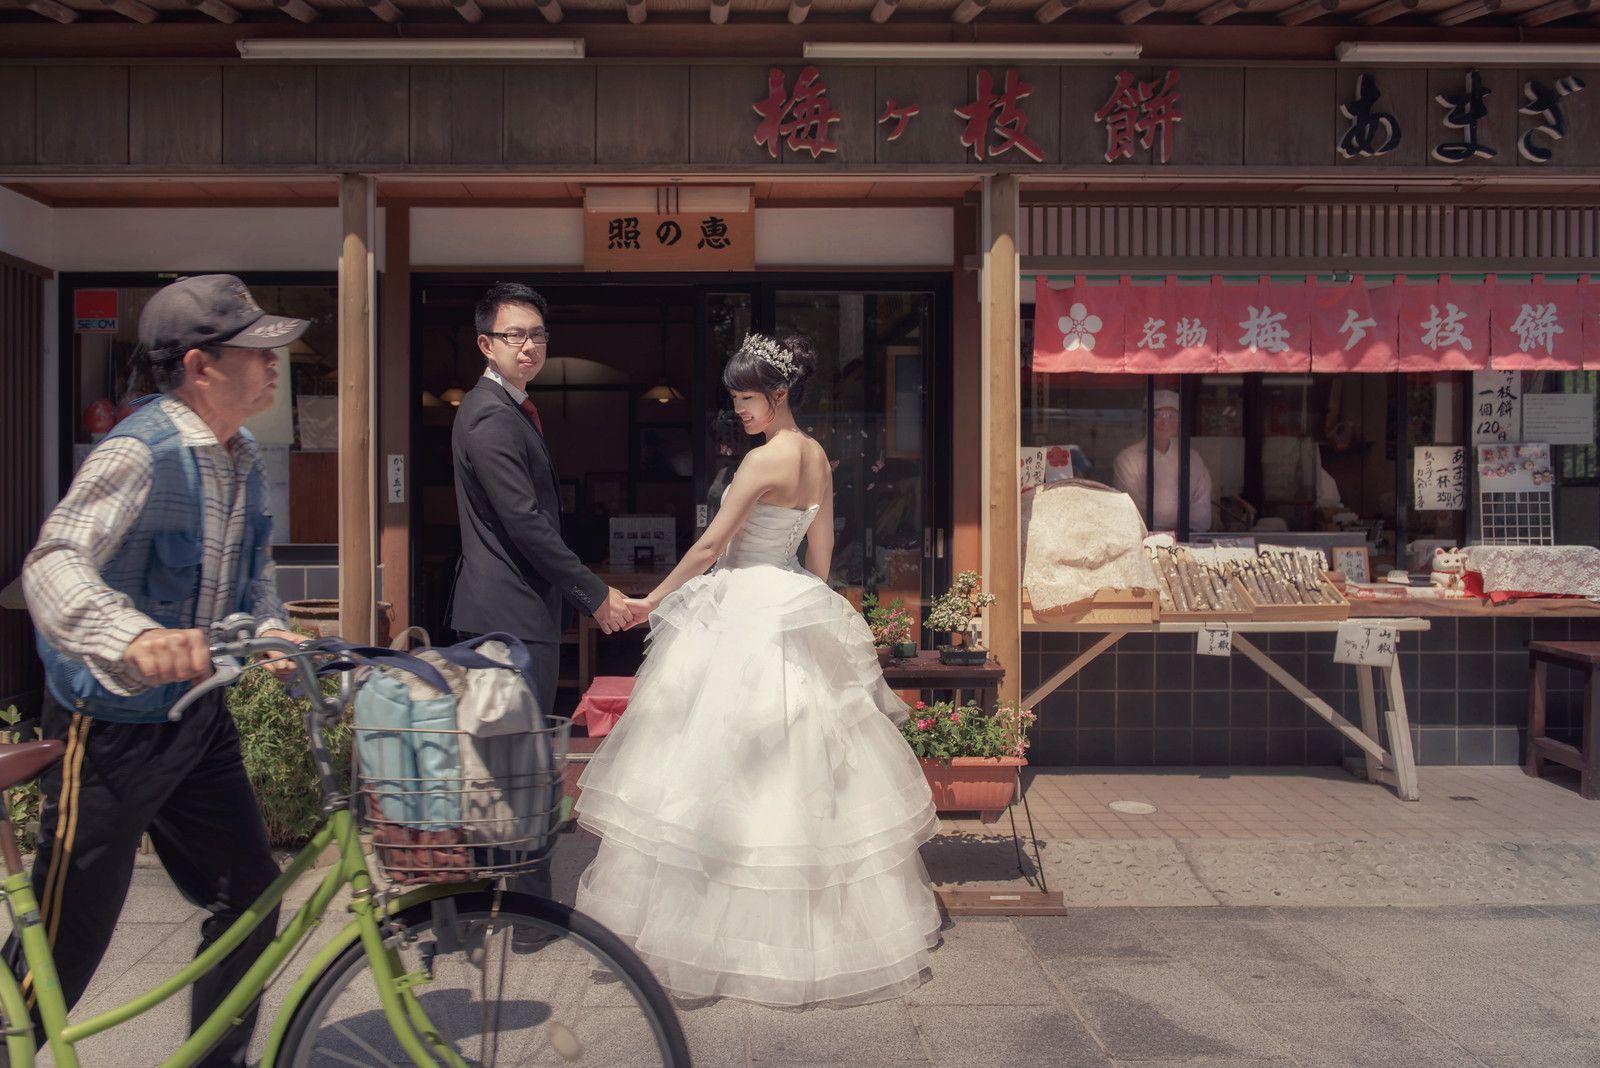 2015 japan kyushu prewedding 日本九州熚本婚紗 婚攝omer kyushu